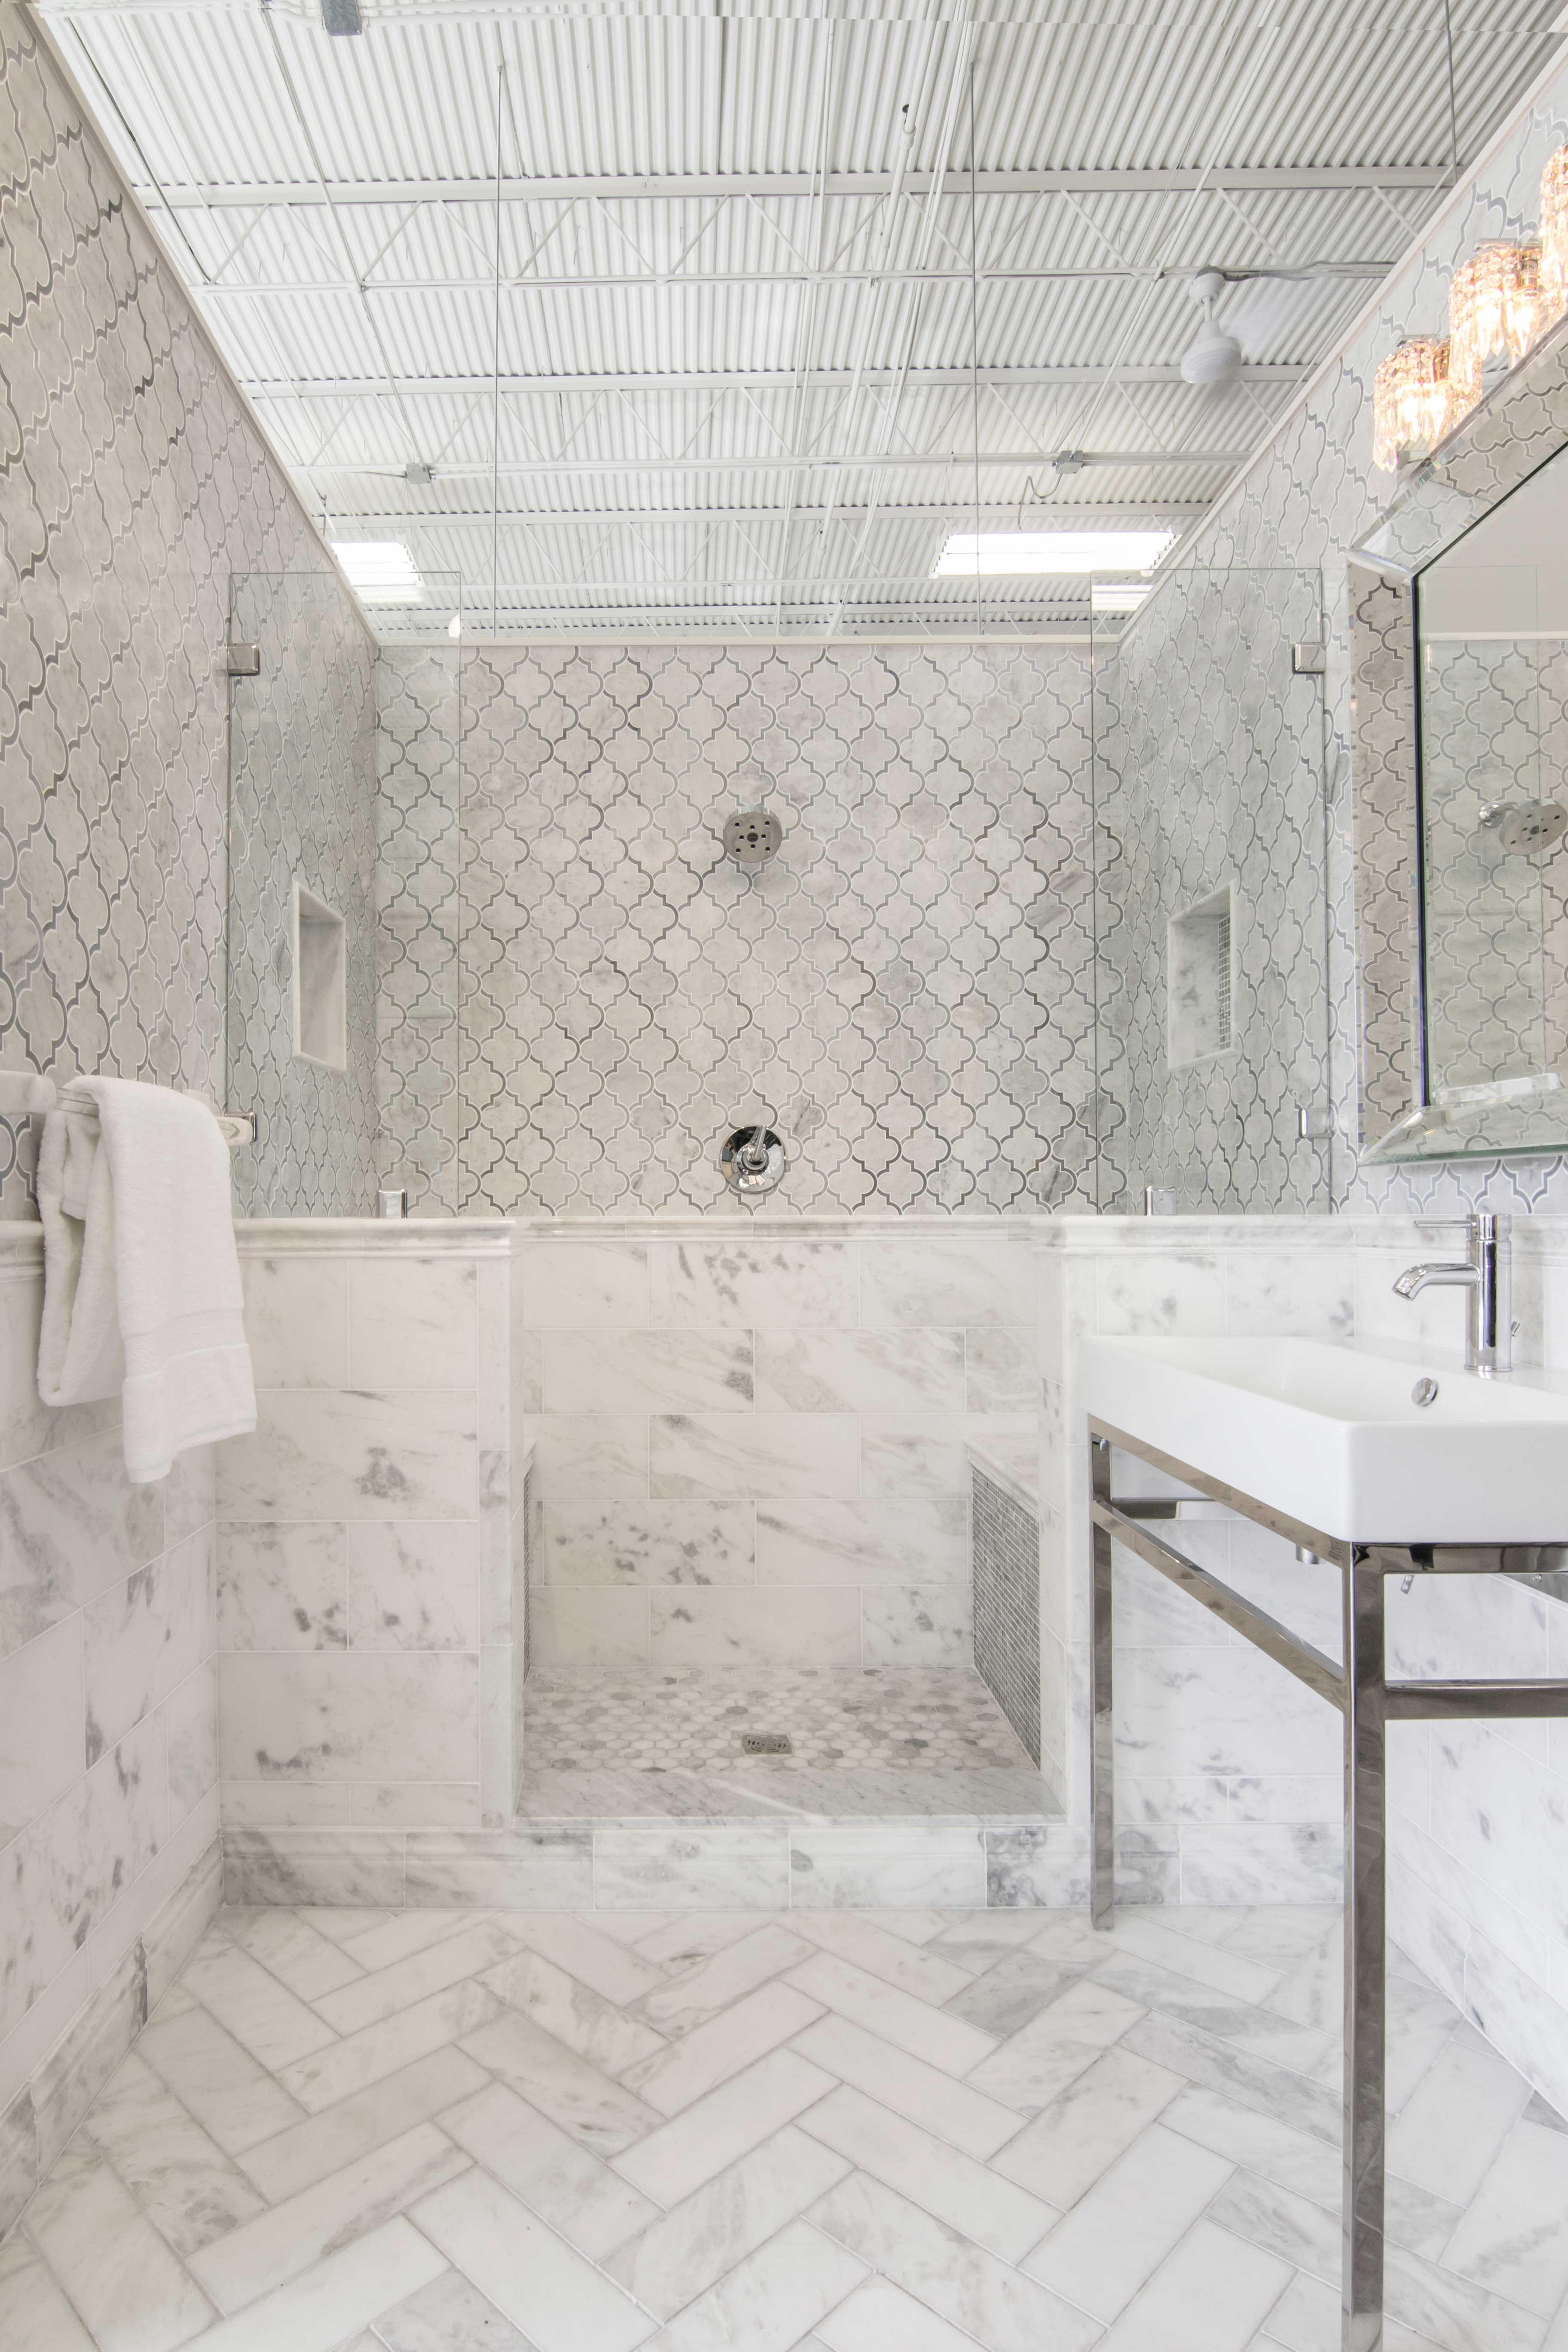 White Bathroom Tile Tempesta Neve Polished Marble Subway Tile Carrera Marble Bathroom Bathroom Design Marble Bathroom Floor